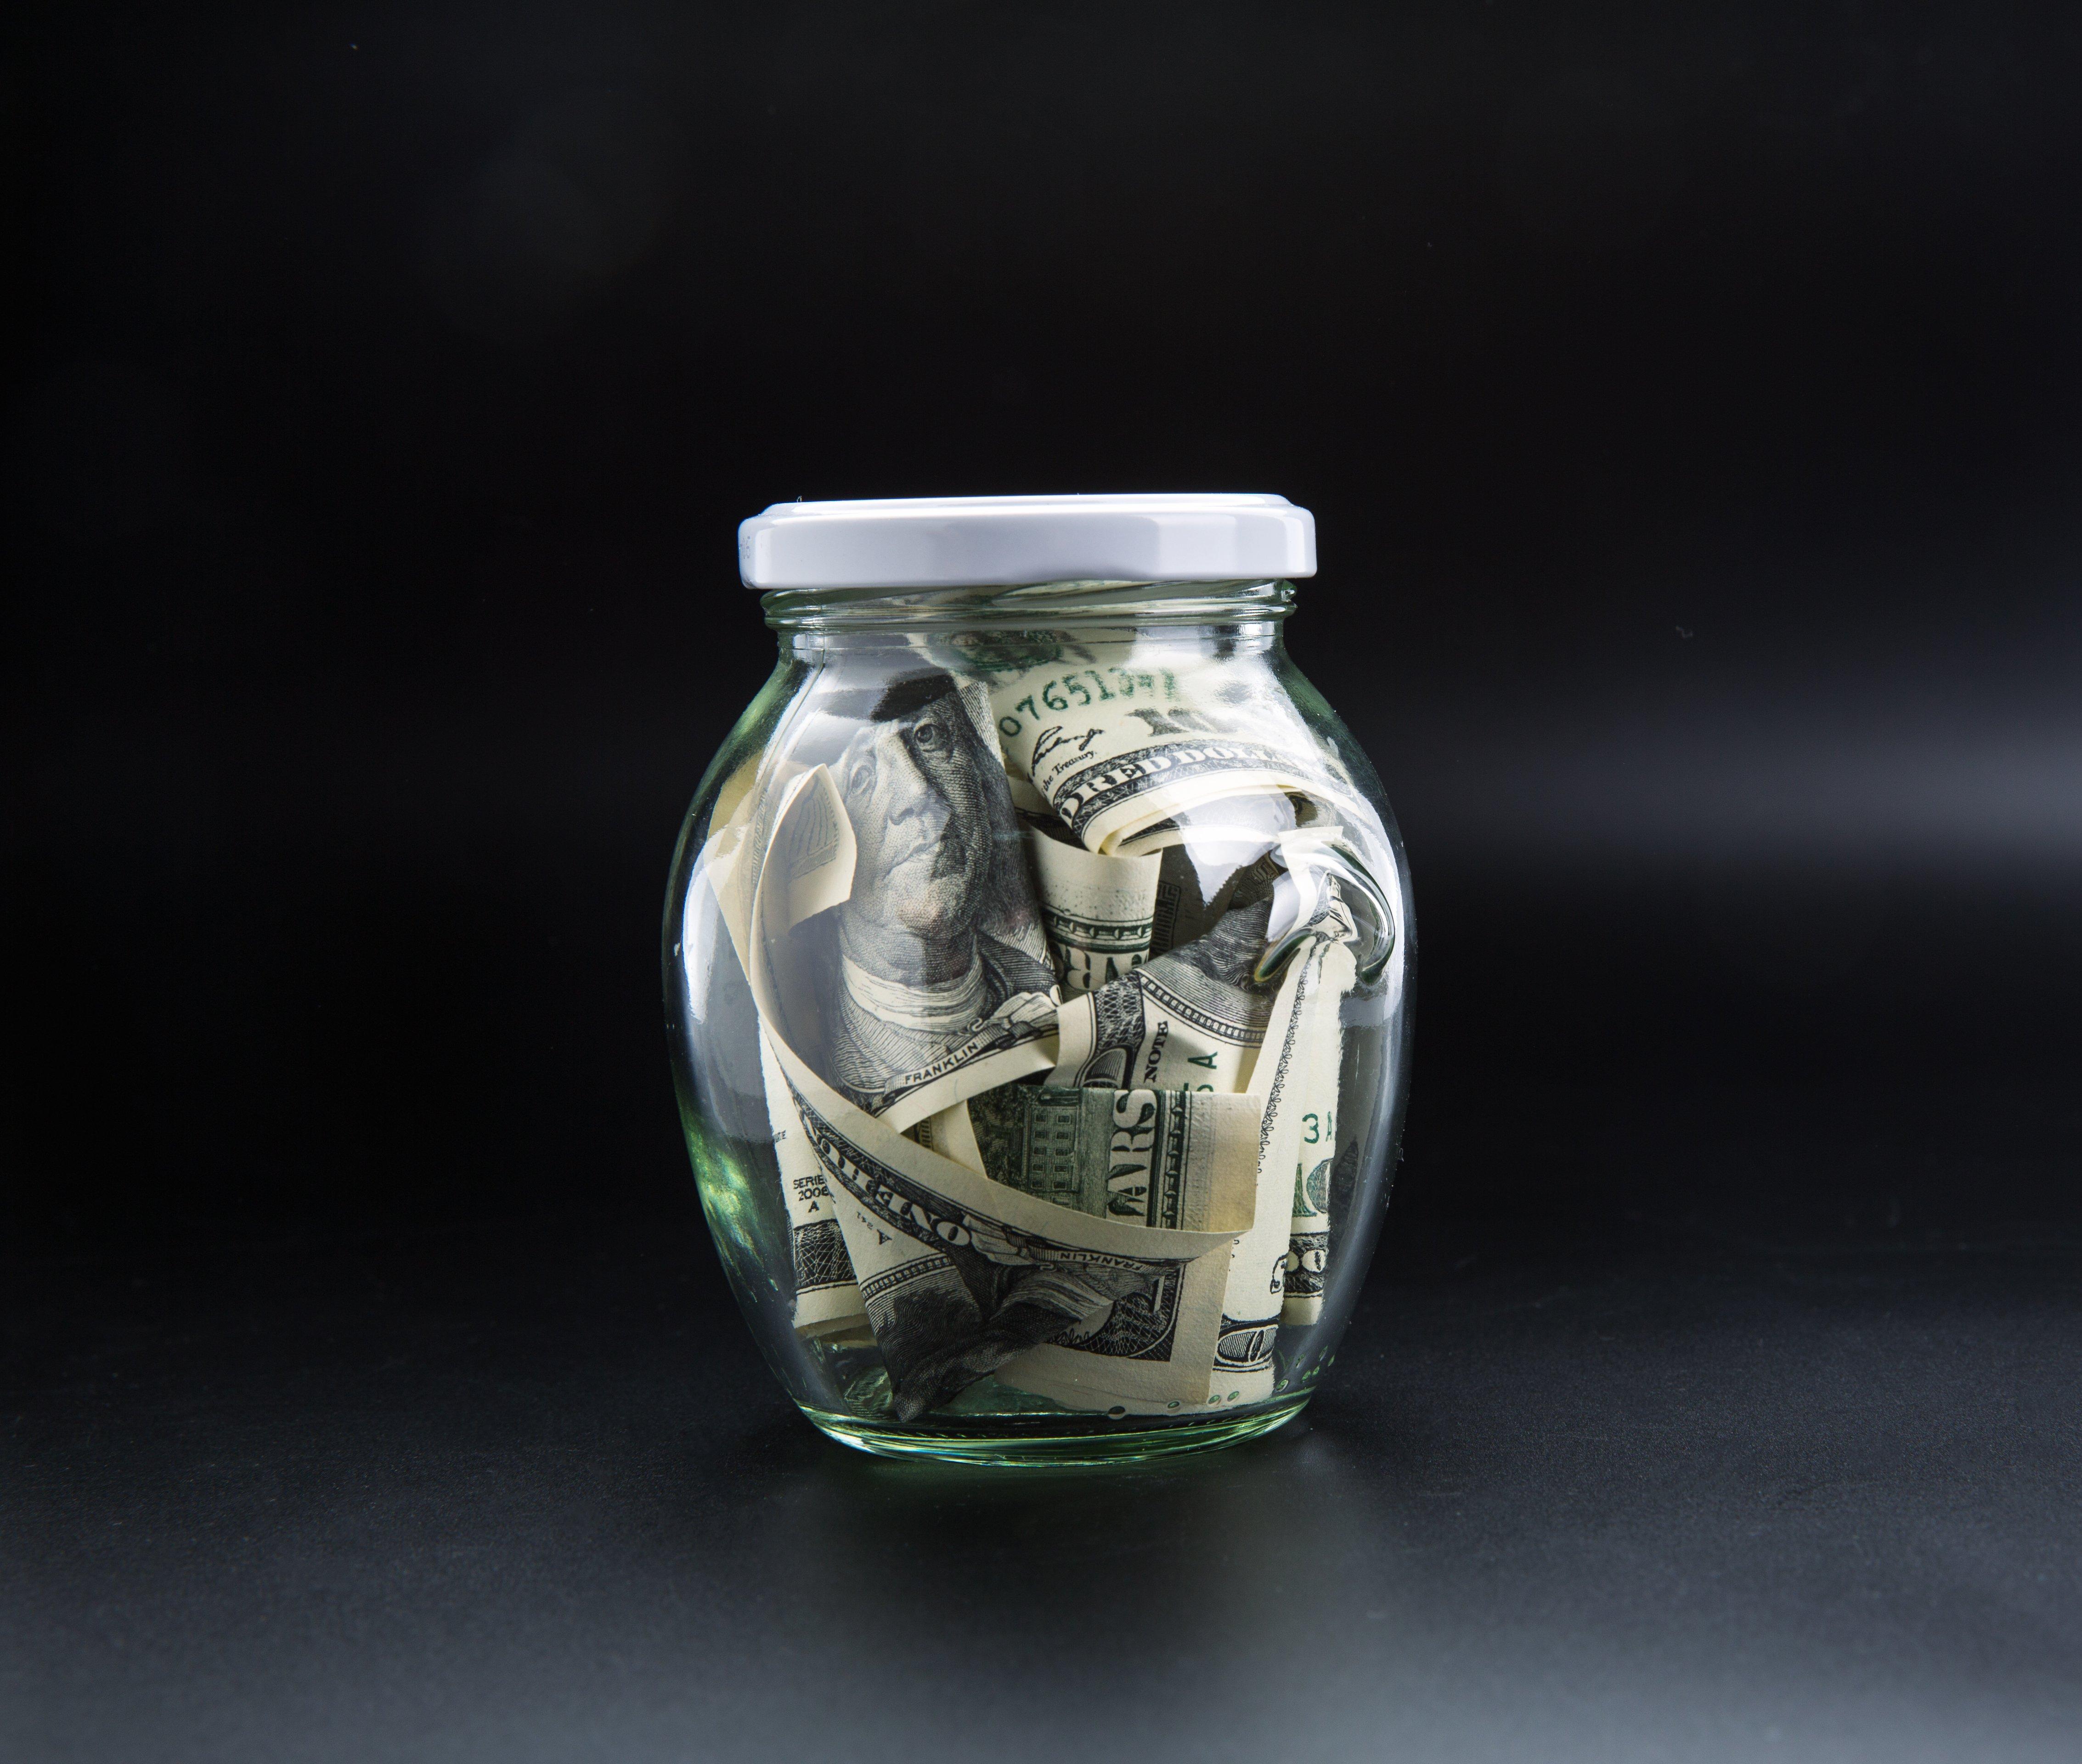 money-saving-concept-glass-jar-full-of-dollars-PWNZMK5